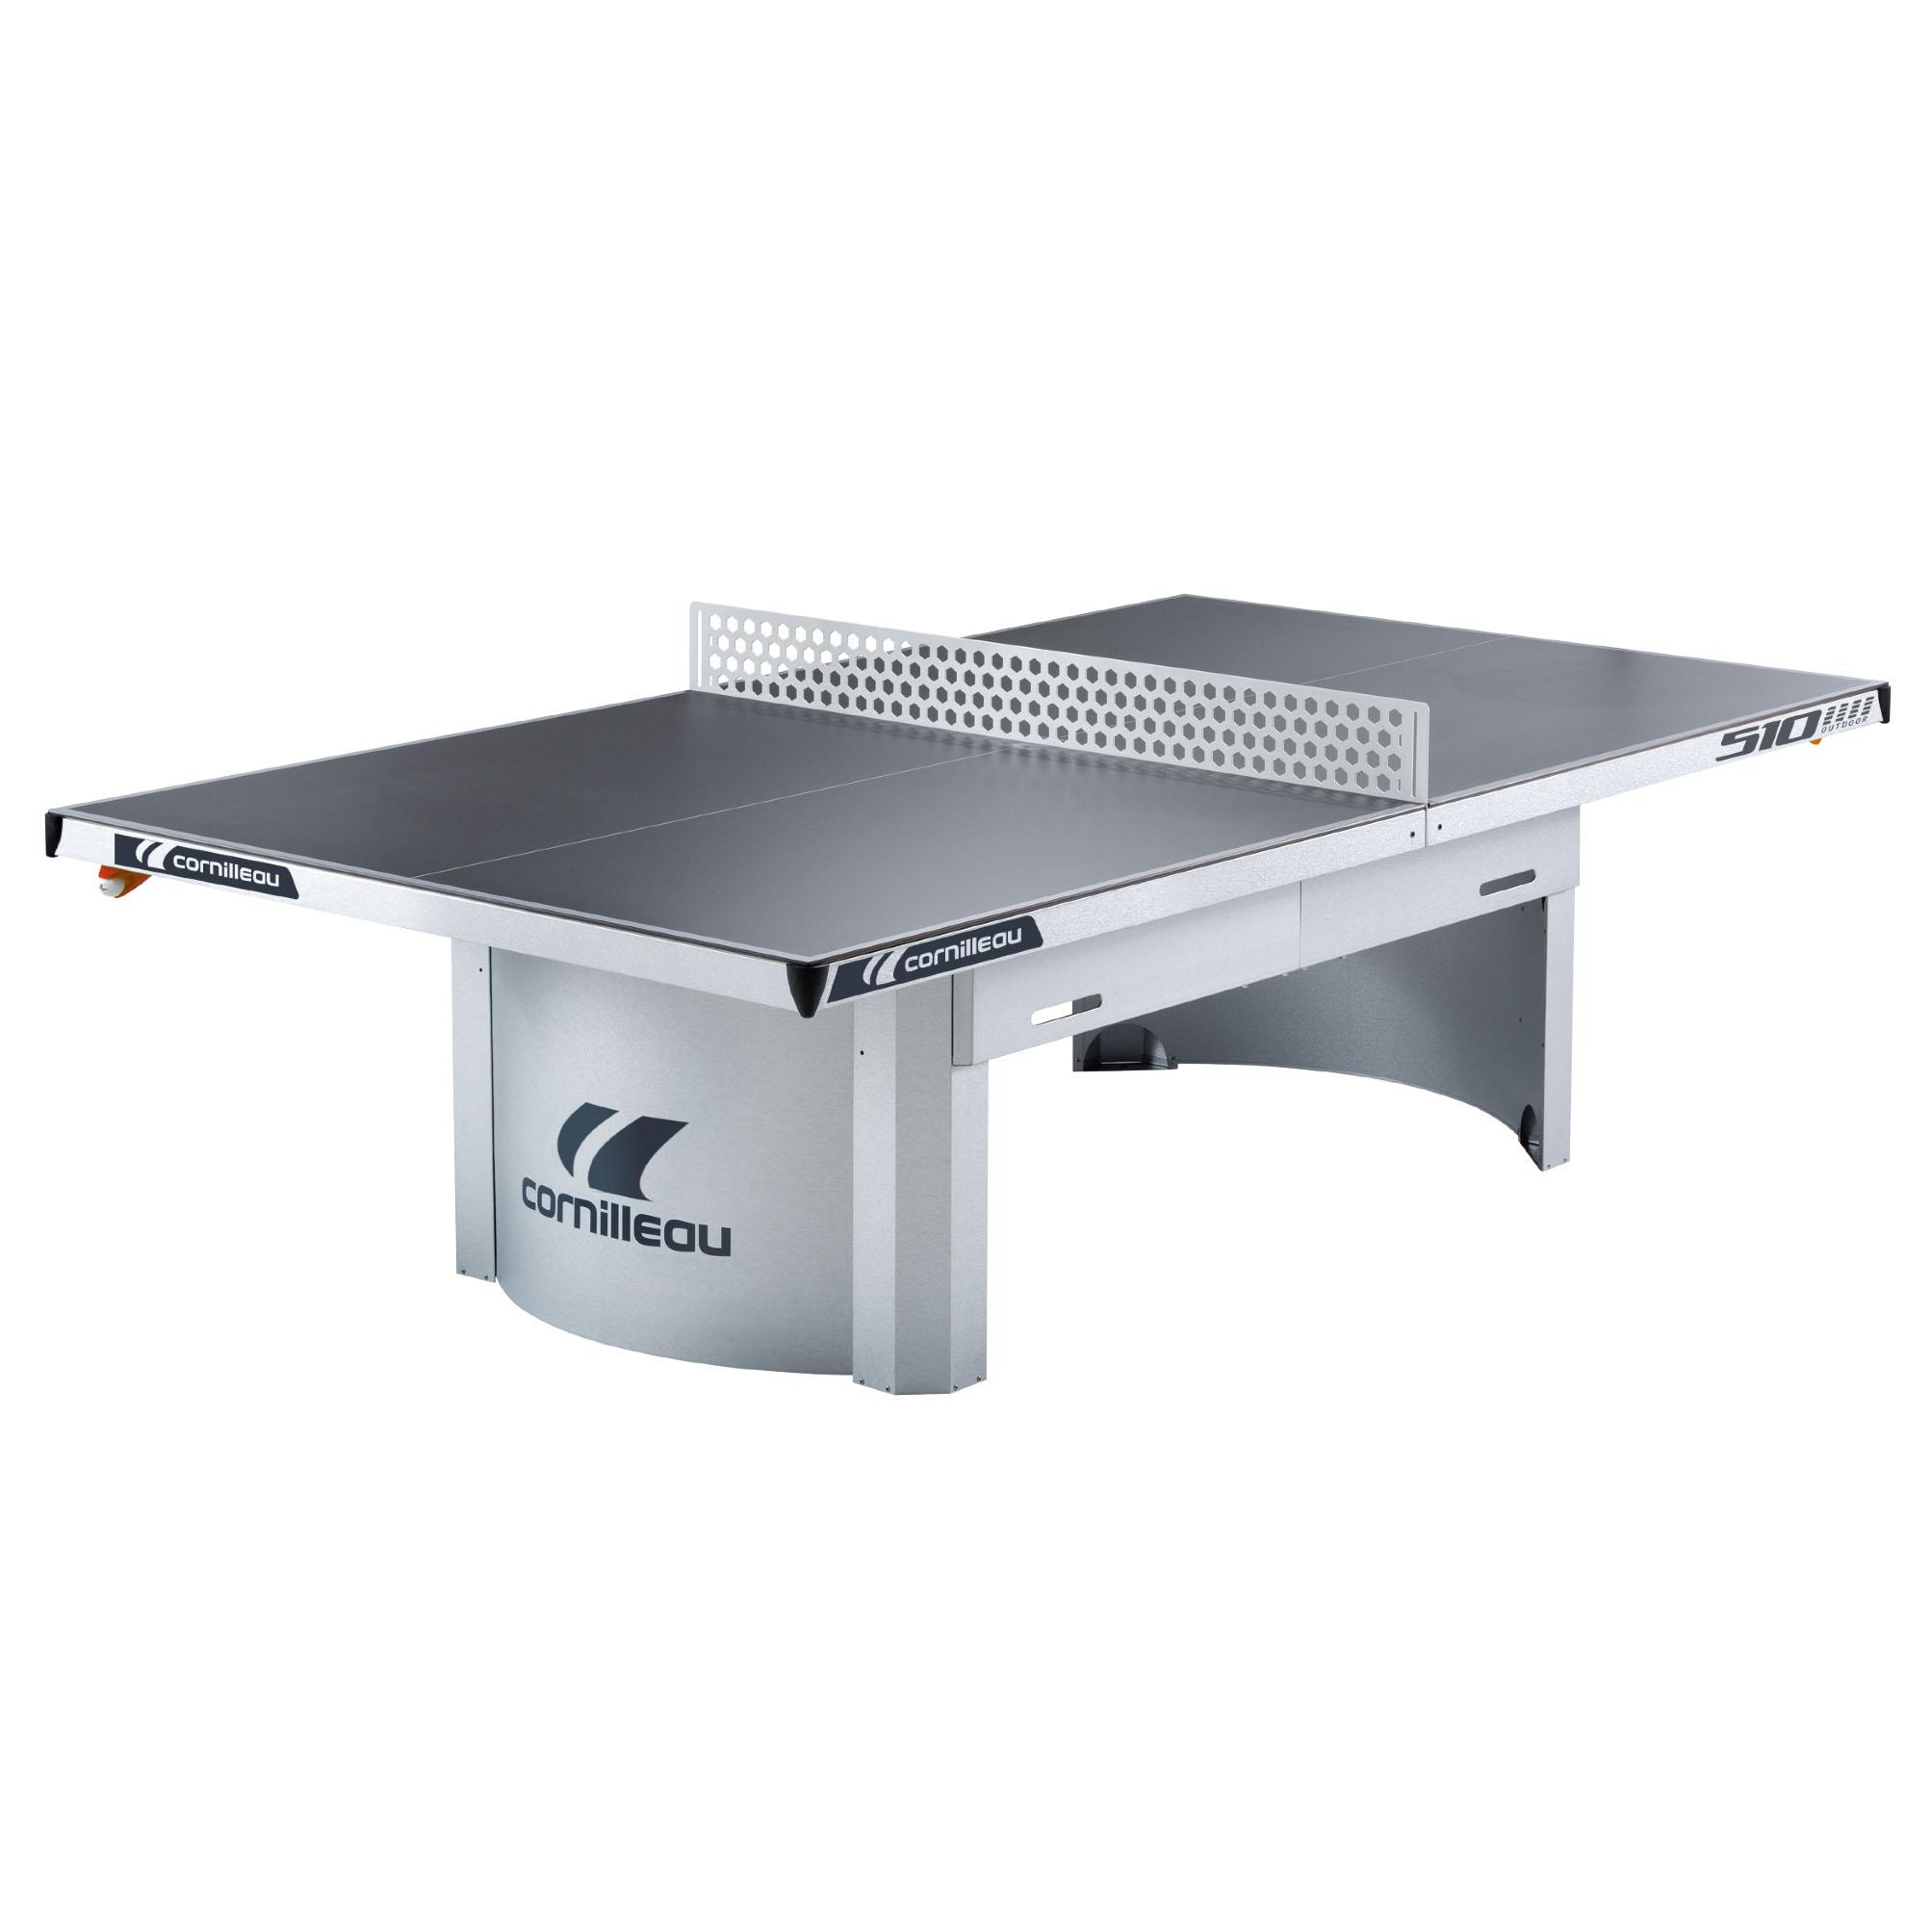 Cornilleau Proline 510 Static Outdoor Table Tennis Table  Grey